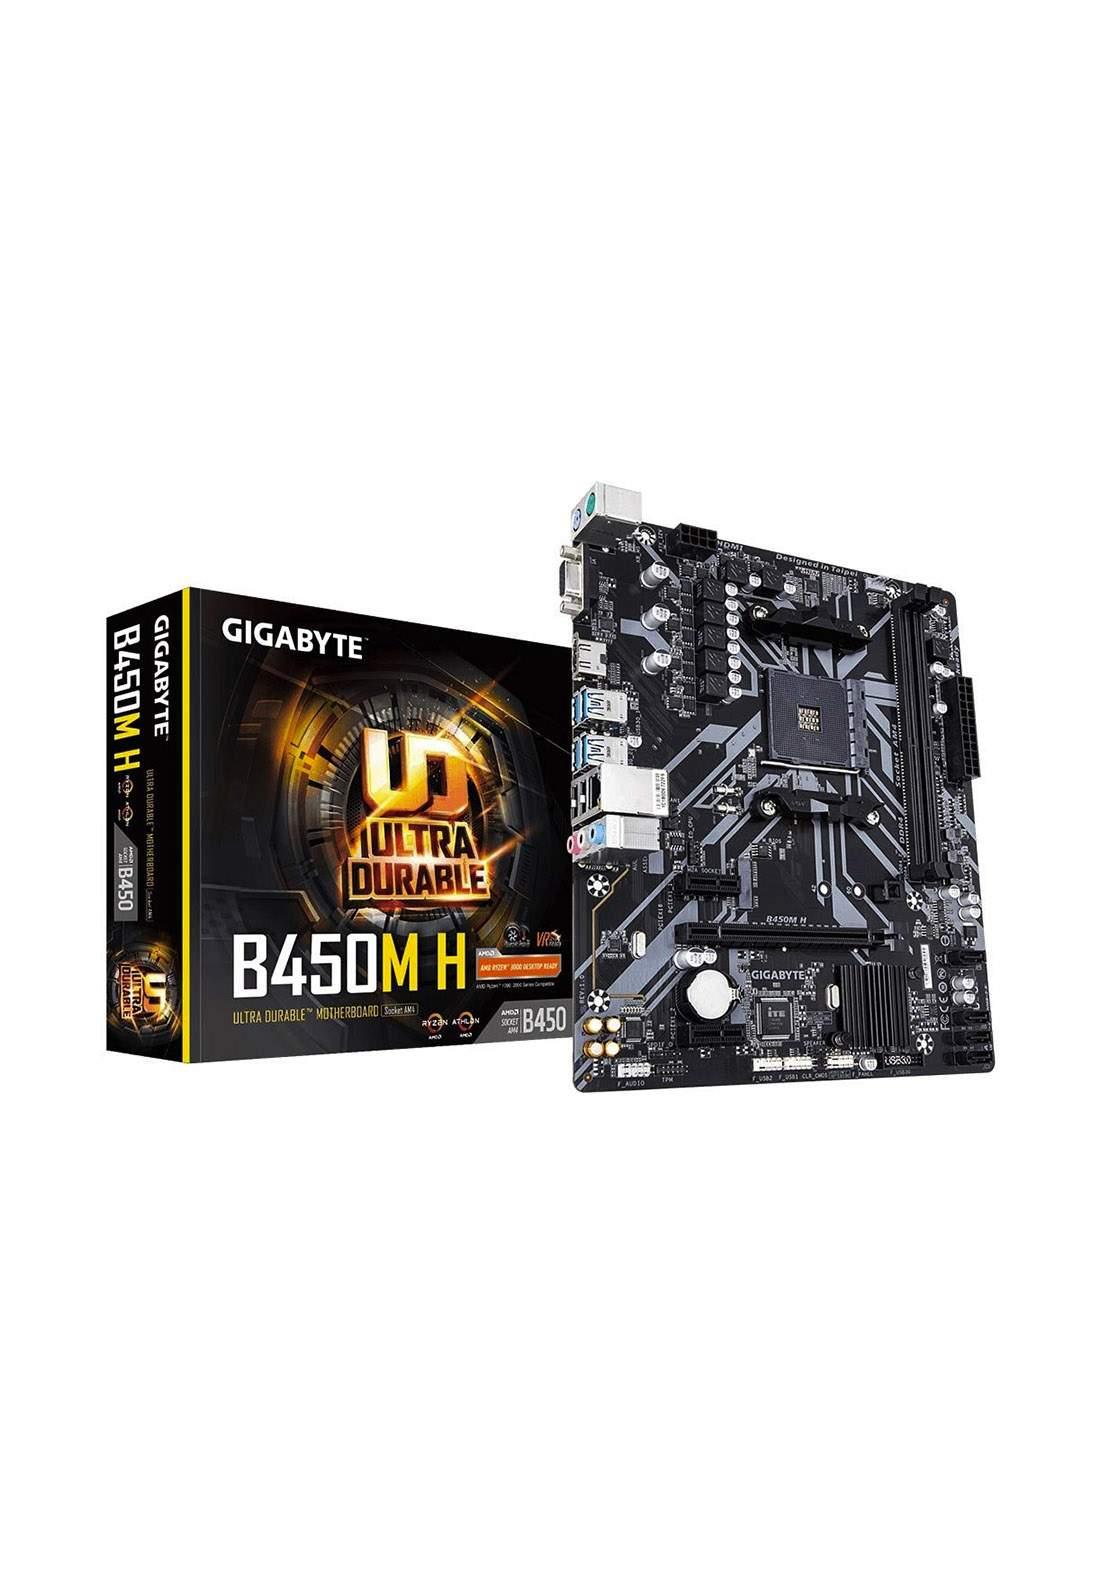 Gigabyte B450M H Ultra Durable Motherboard - Black لوحة الام